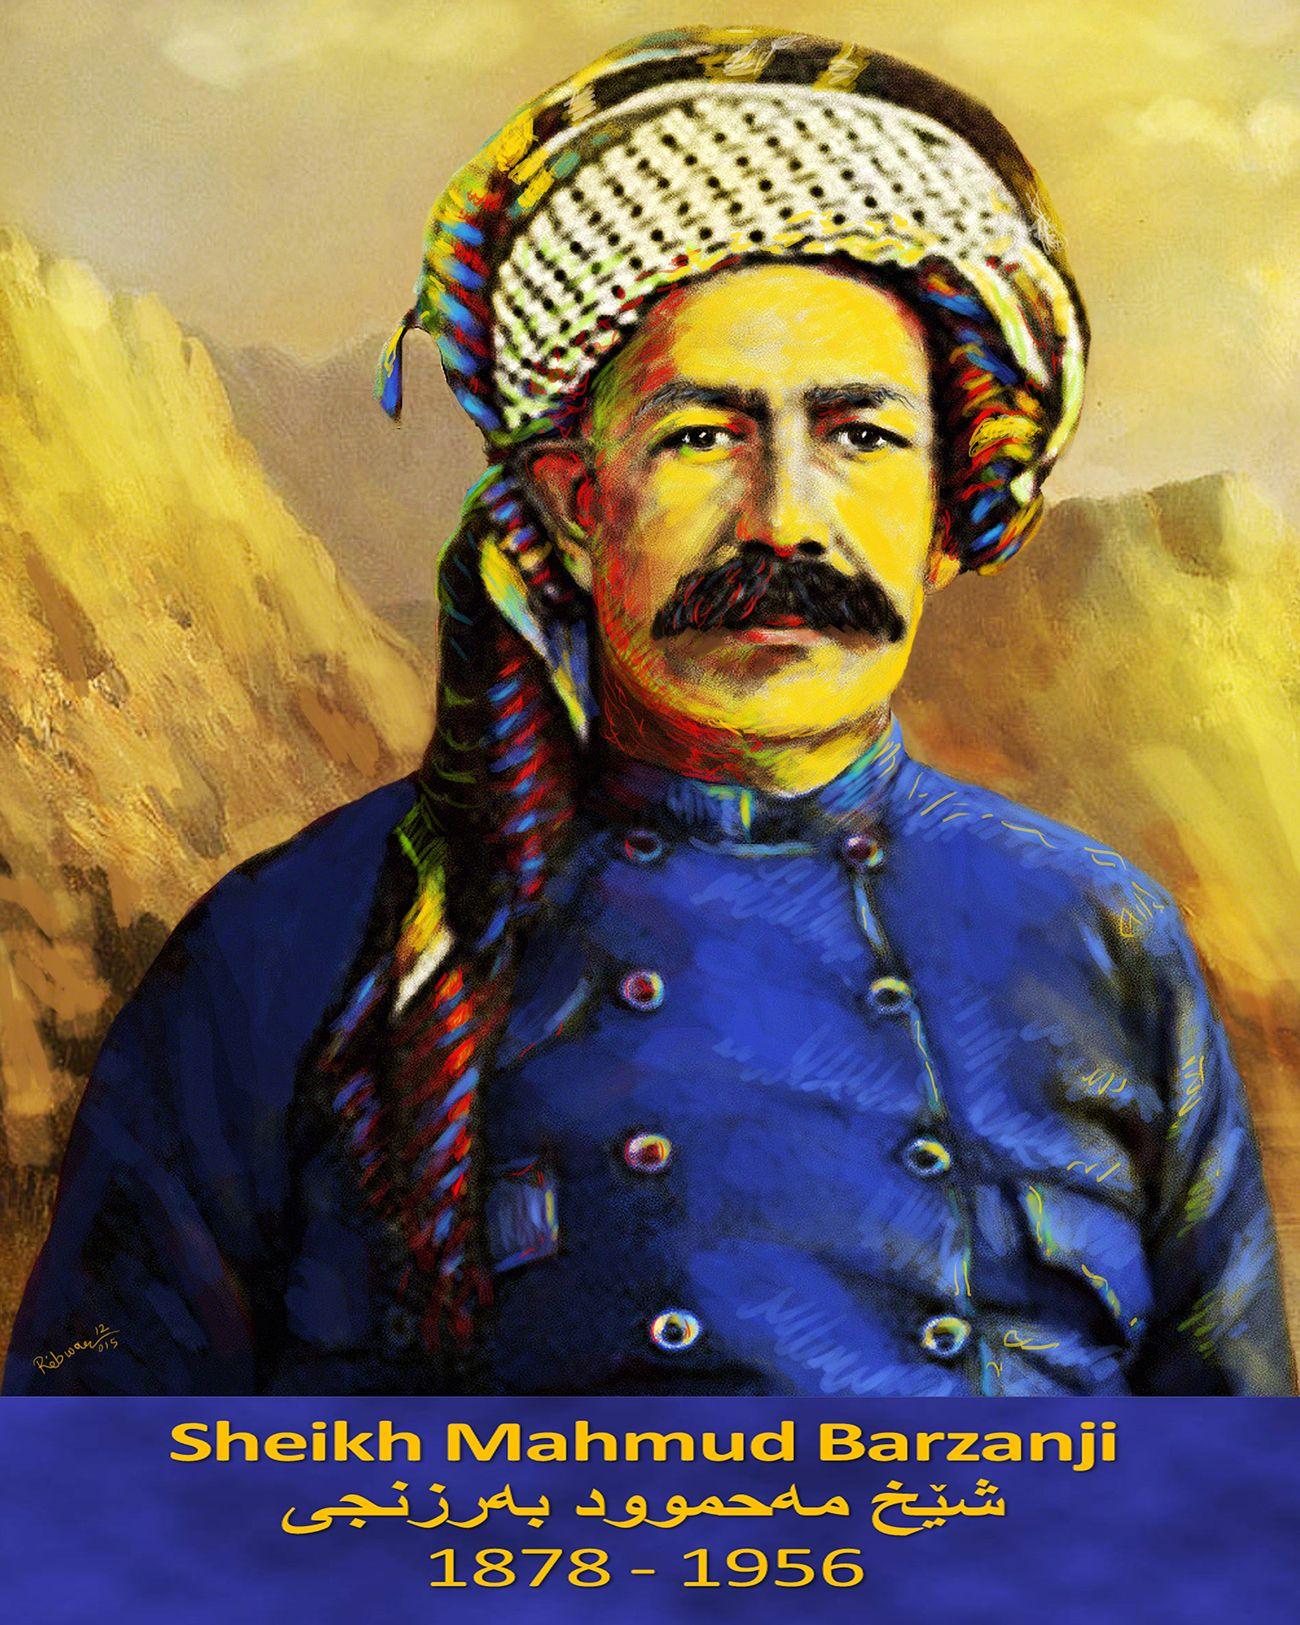 Pin By Yasa Hasanpour On History Of Kurdestan: Sheikh Mahmud Barzanji (1878-1956) Was The Leader Of A